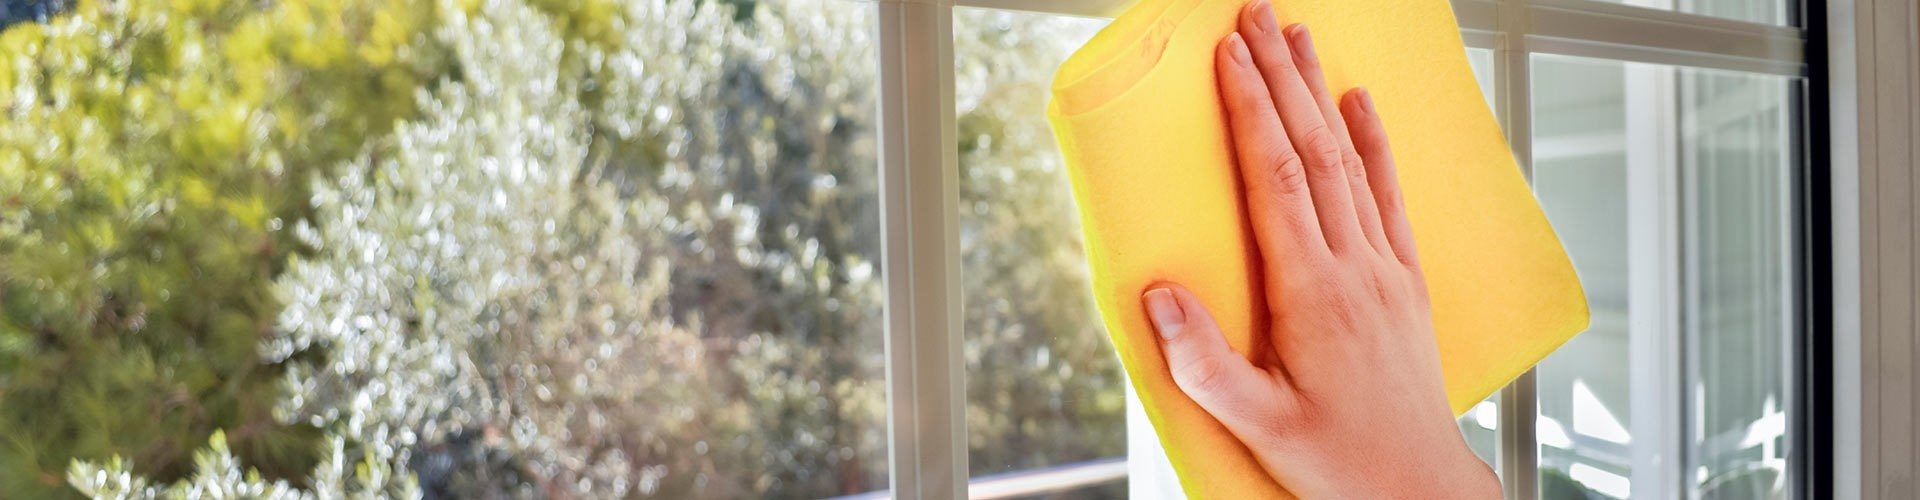 aktiv serivce privat rengøring odense